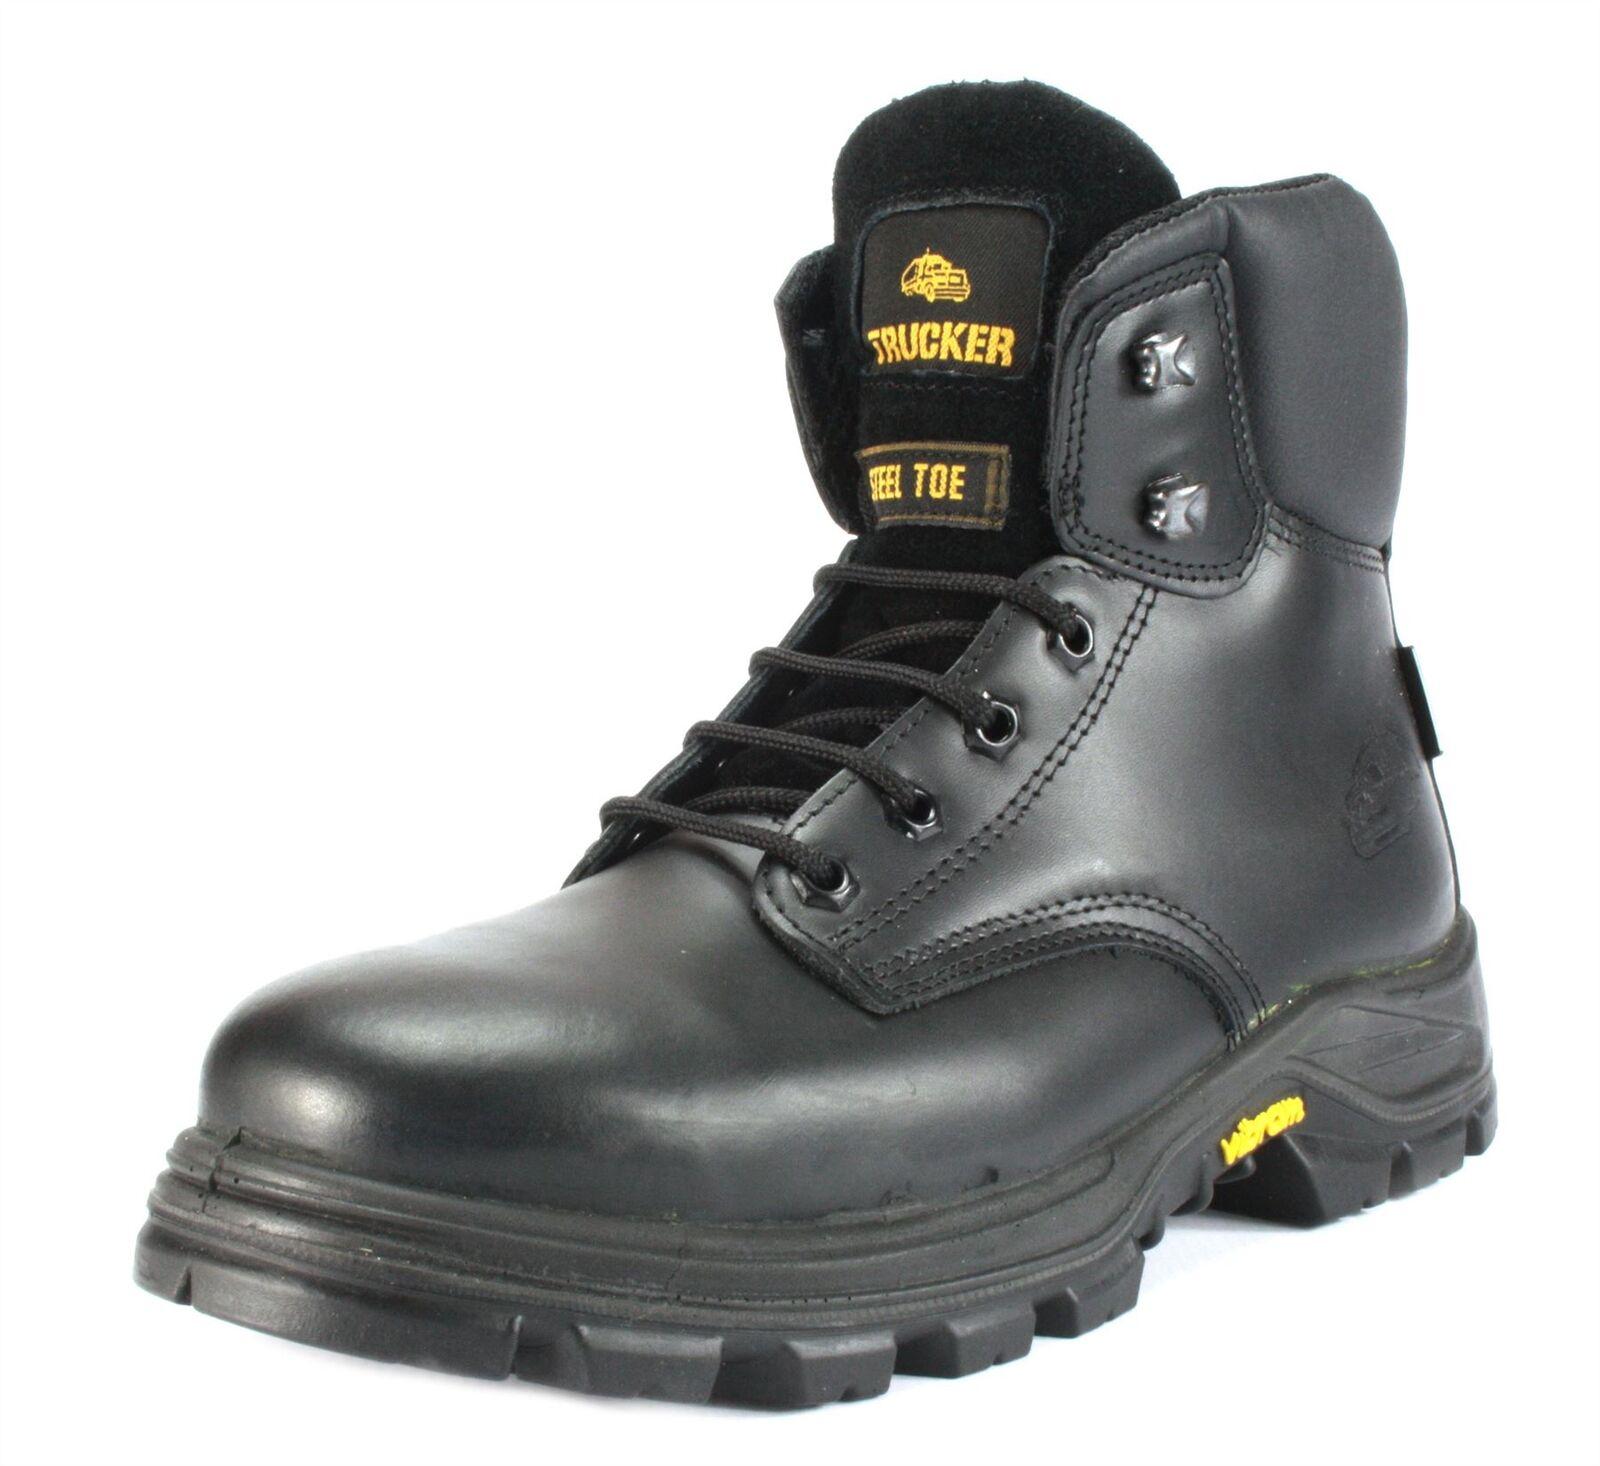 Aimont Jallatte Pioneer Vibram S3 Leather Steel Toecap Midsole Mens Lace Boots